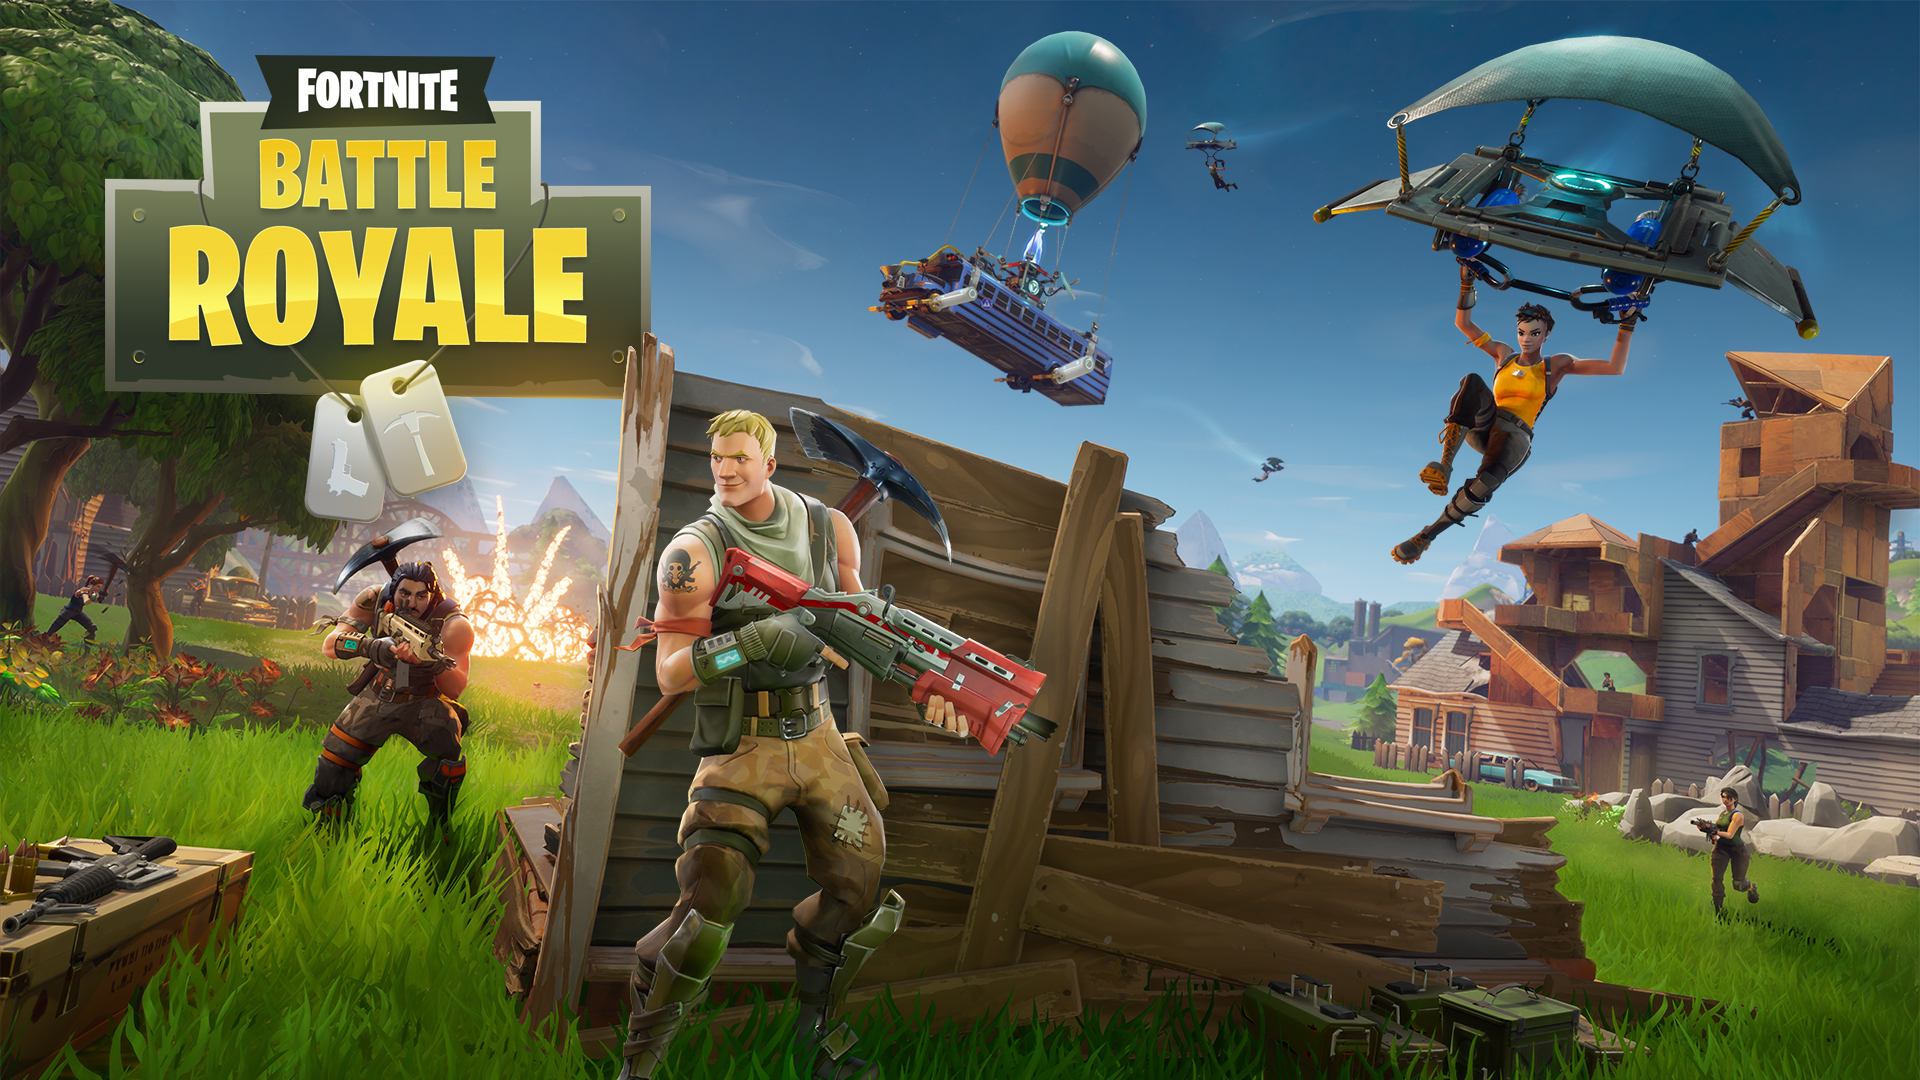 New Fortnite Battle Royale Mode Misses What Makes The Game Great - new fortnite battle royale mode misses what makes the game great